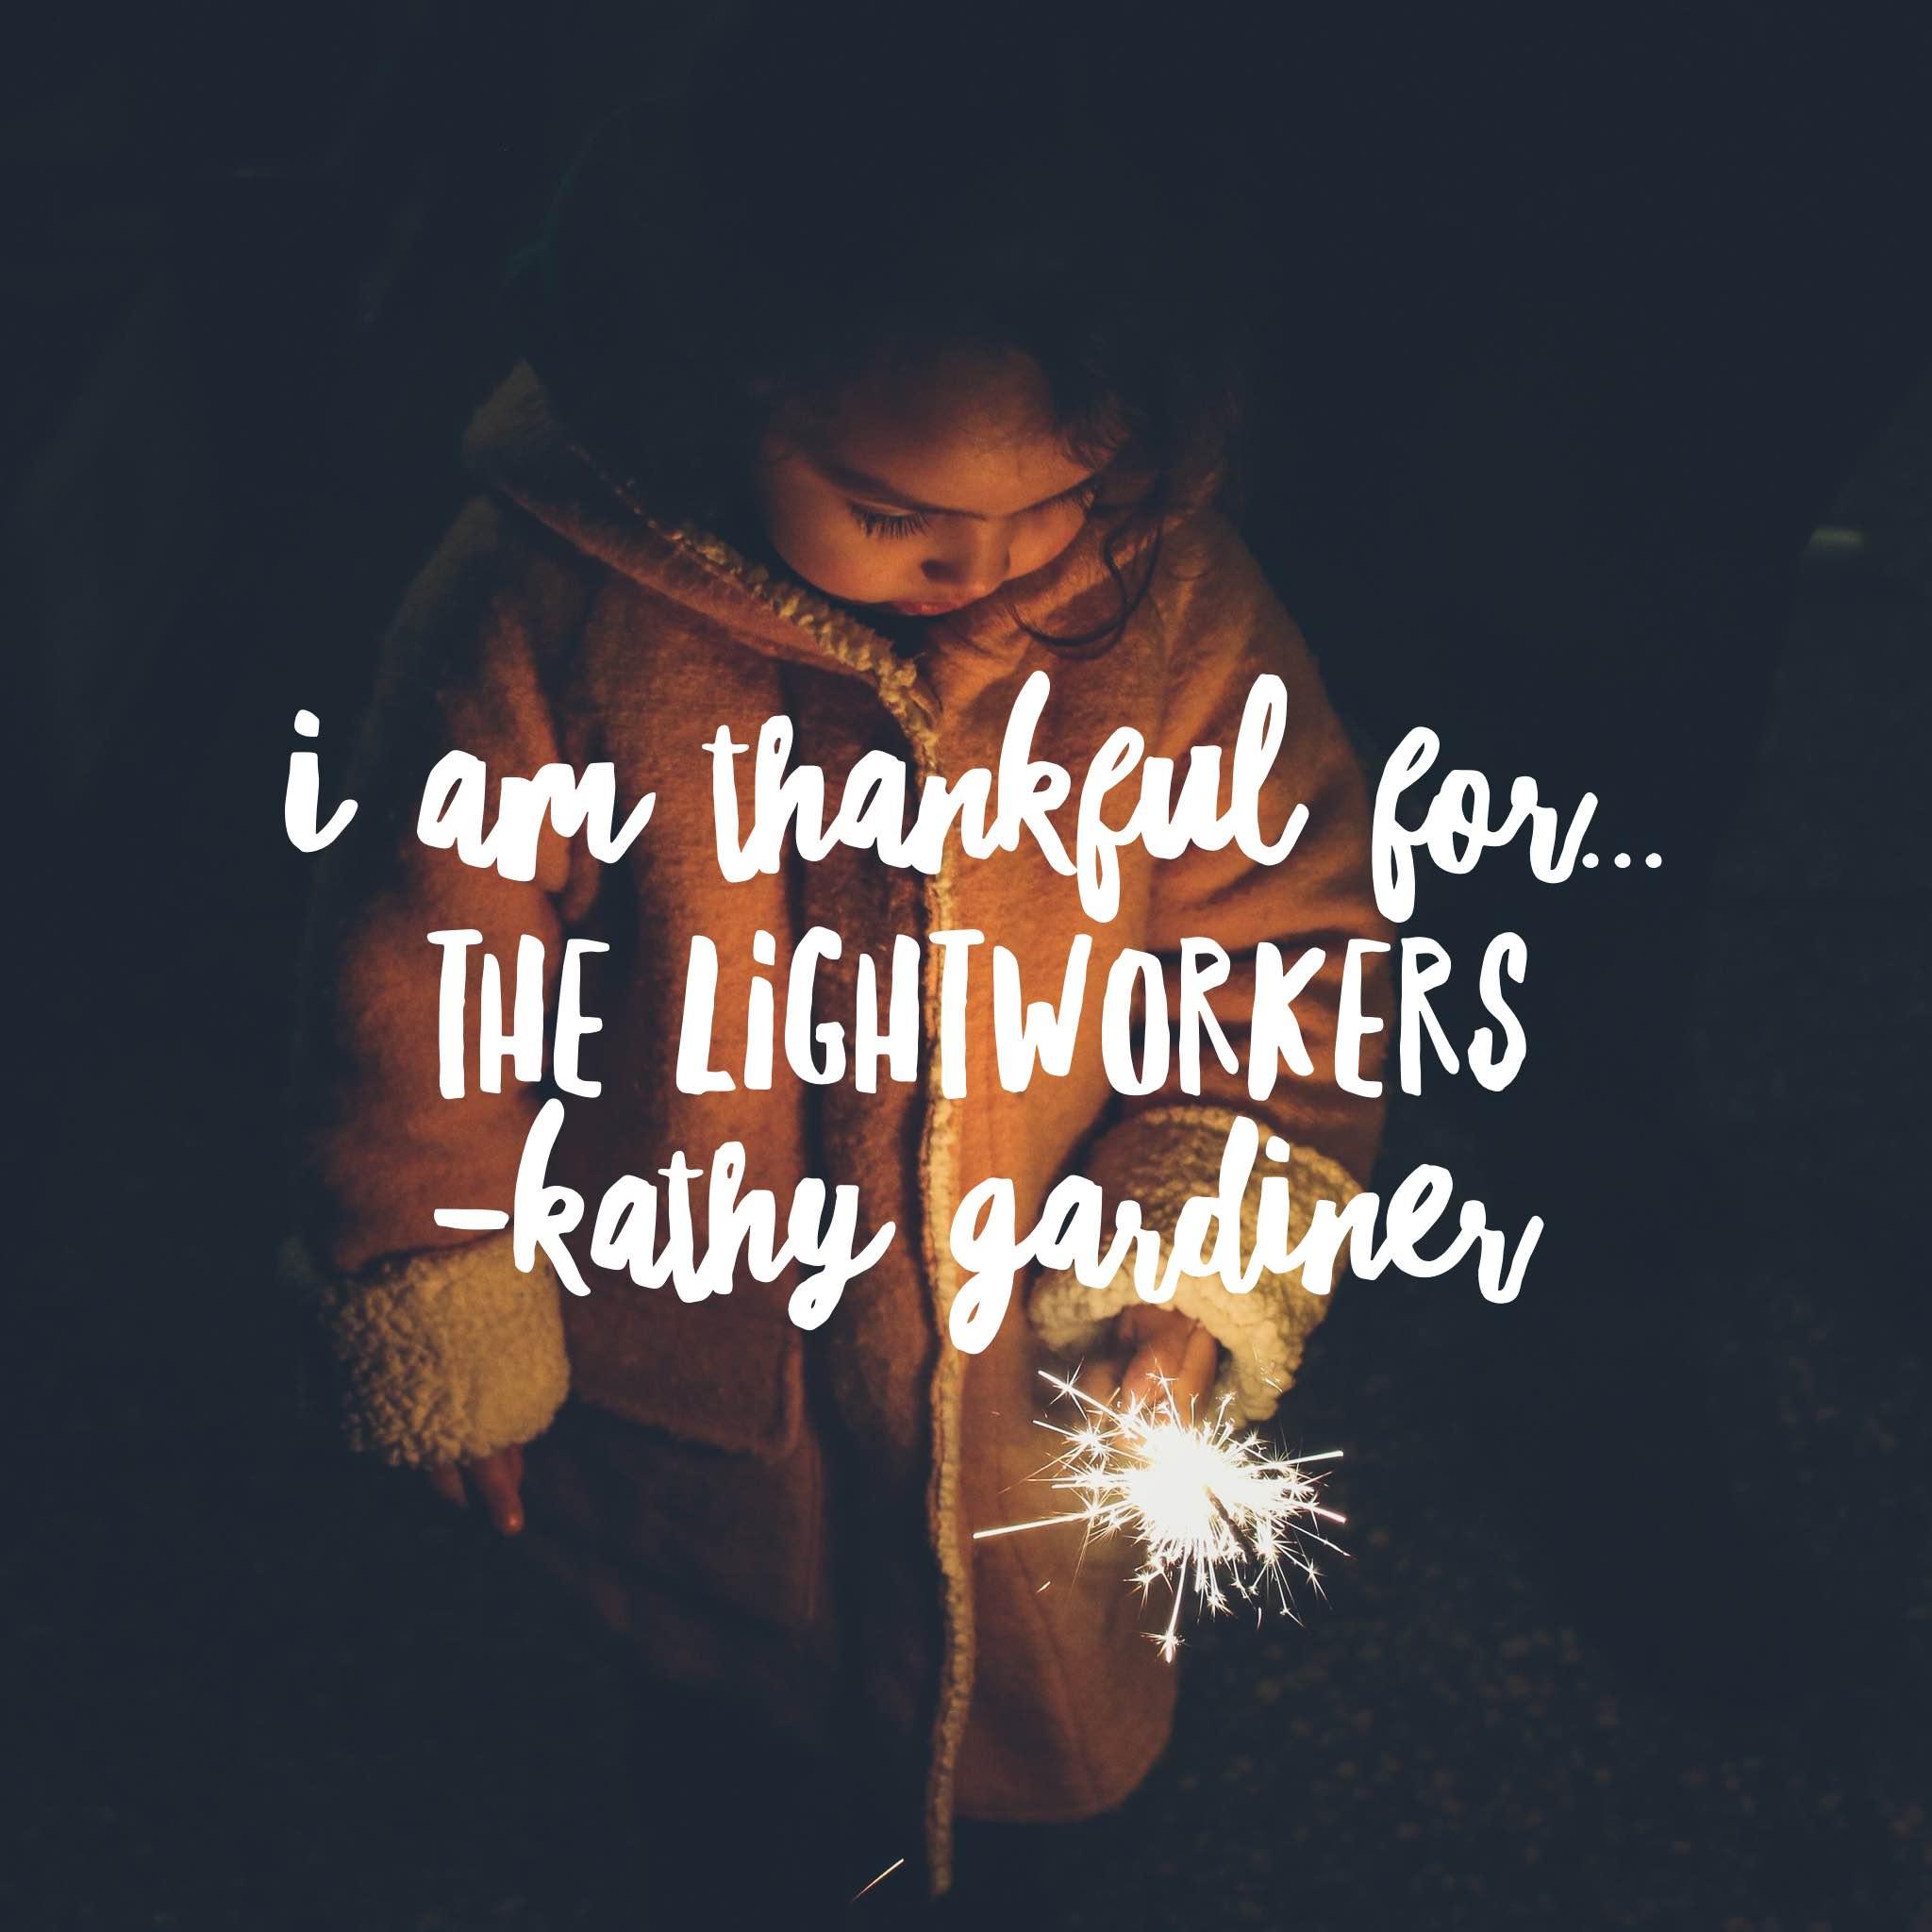 thankful-thursdays-the-lightworkers-kathy-gardiner-the-naked-gardiner